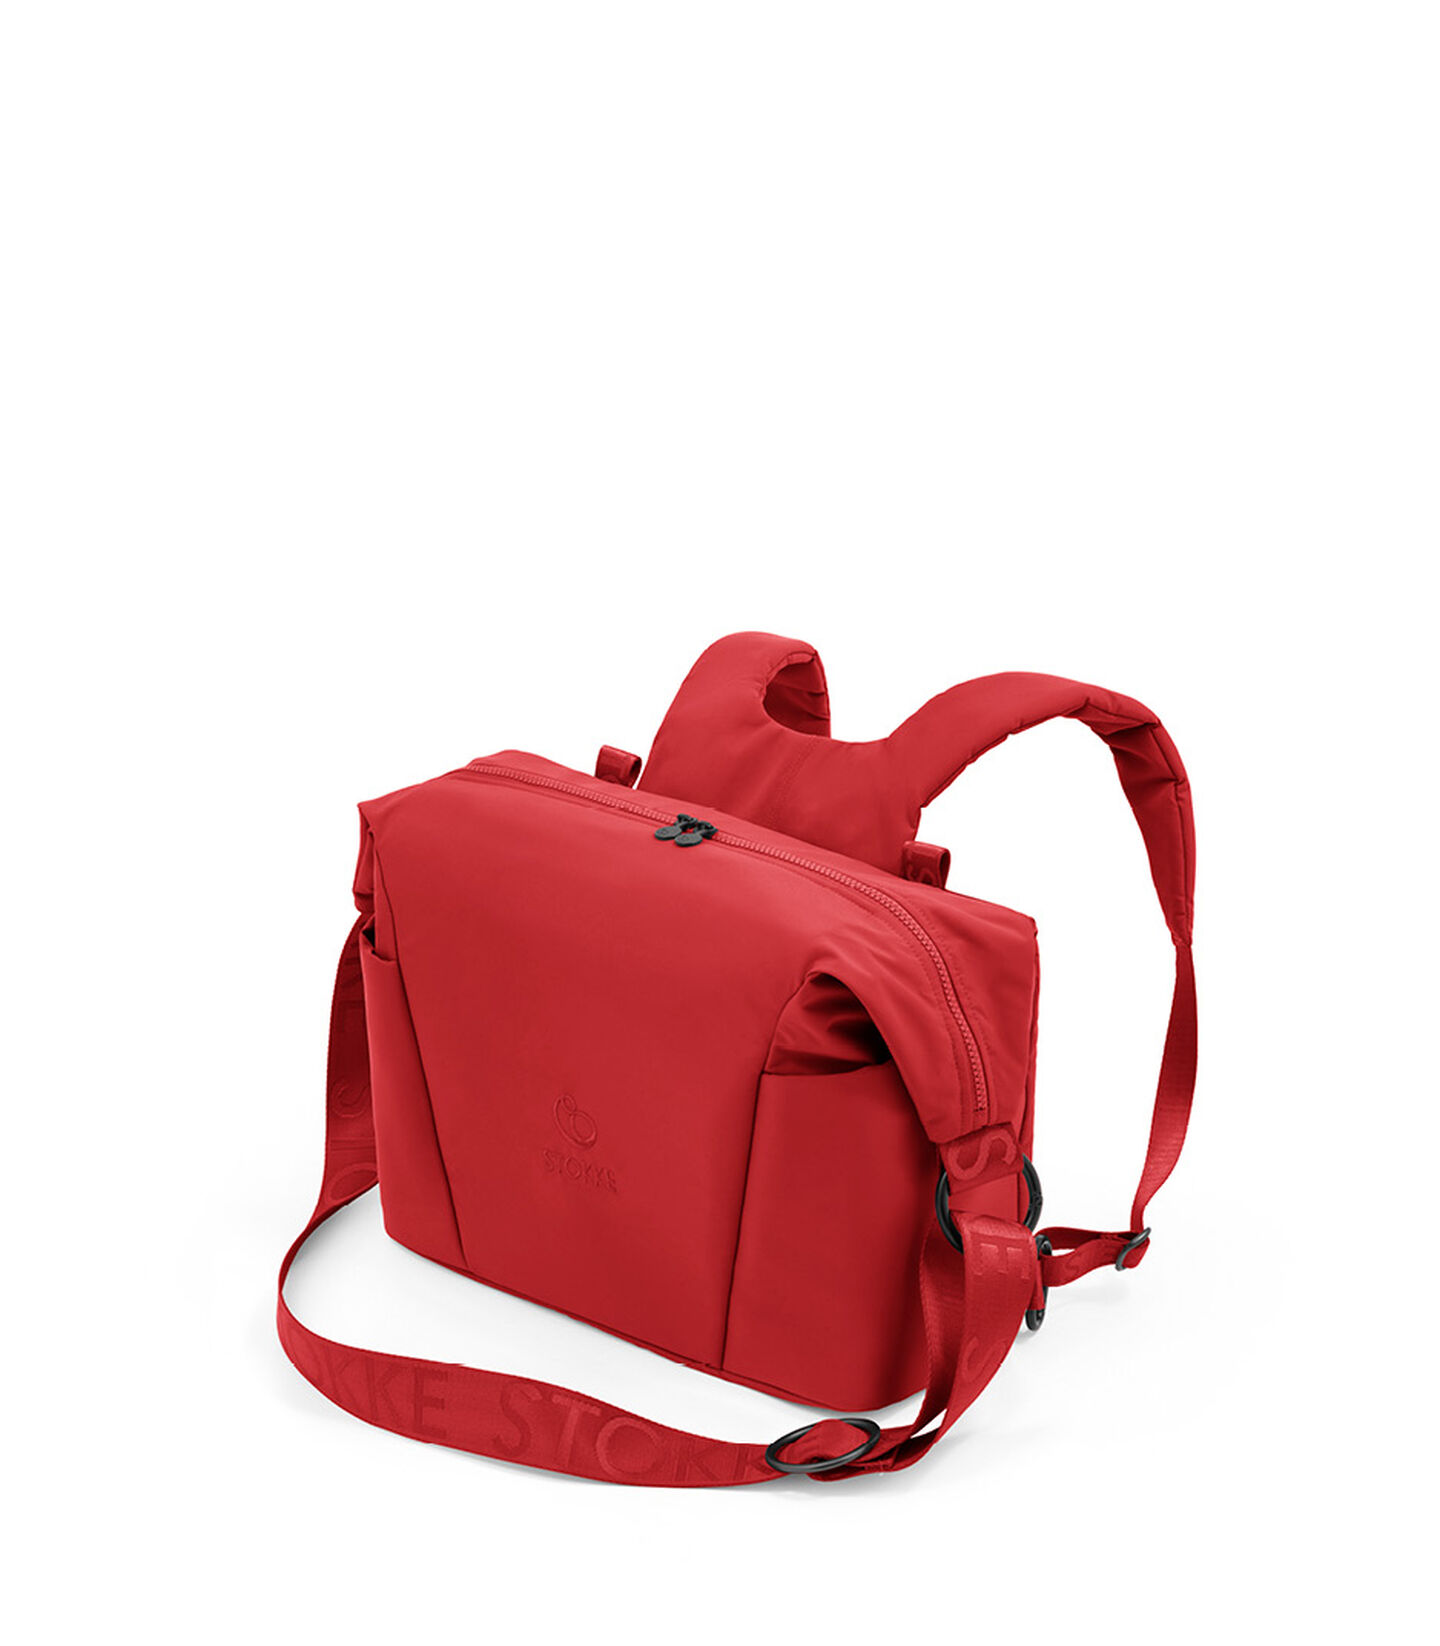 Stokke® Xplory® X verzorgingstas Ruby Red, Ruby Red, mainview view 1